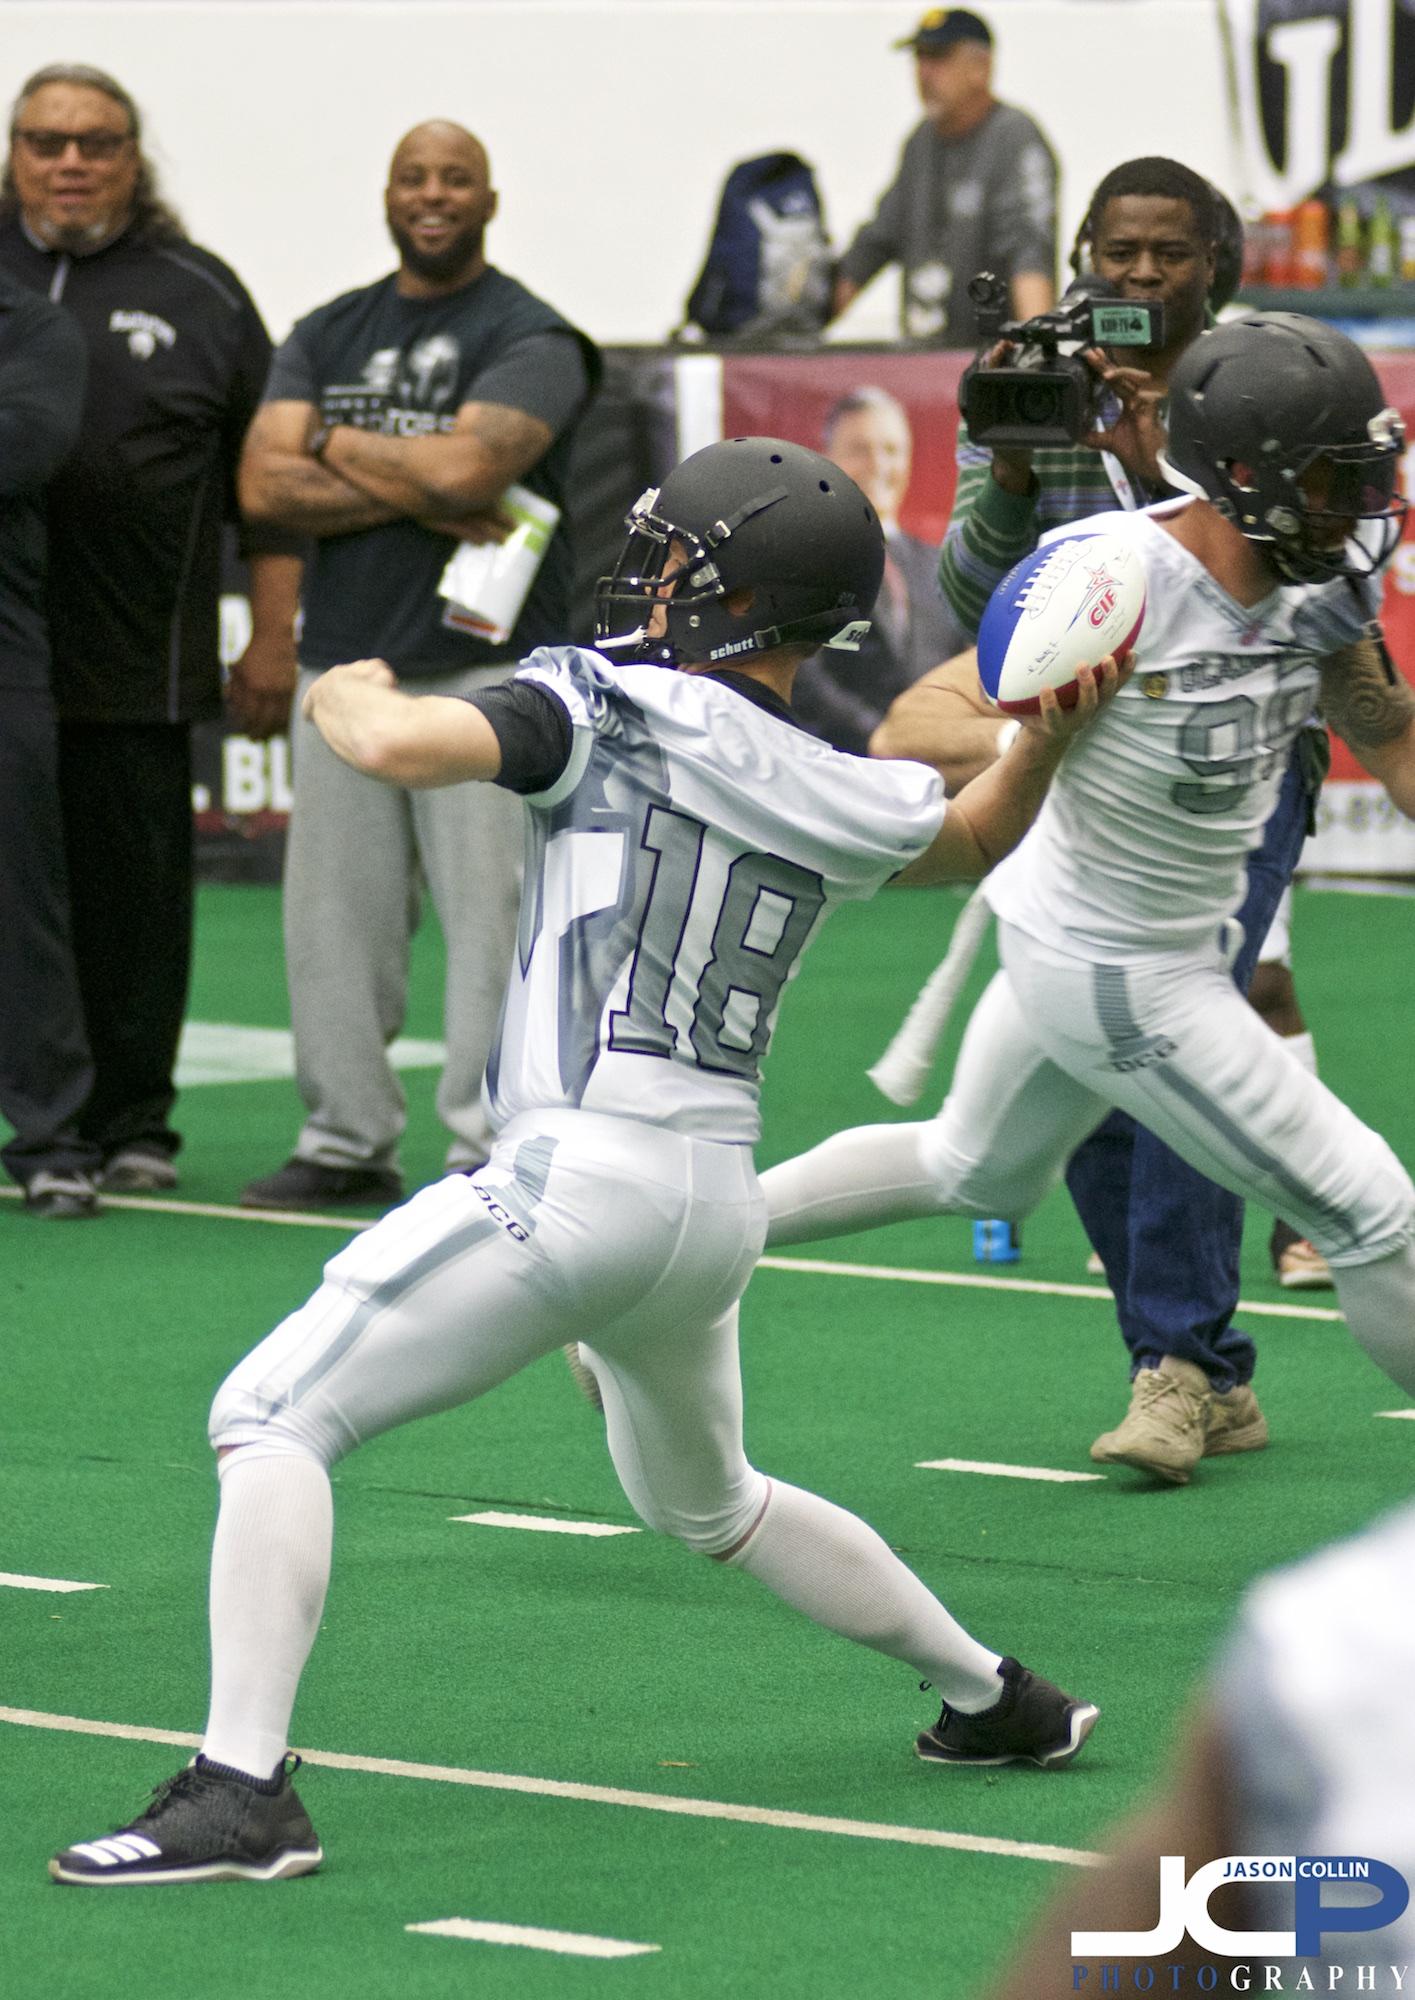 Albuquerque, New Mexico Mayor Tim Keller warms up to play quarterback for the Duke City Gladiators